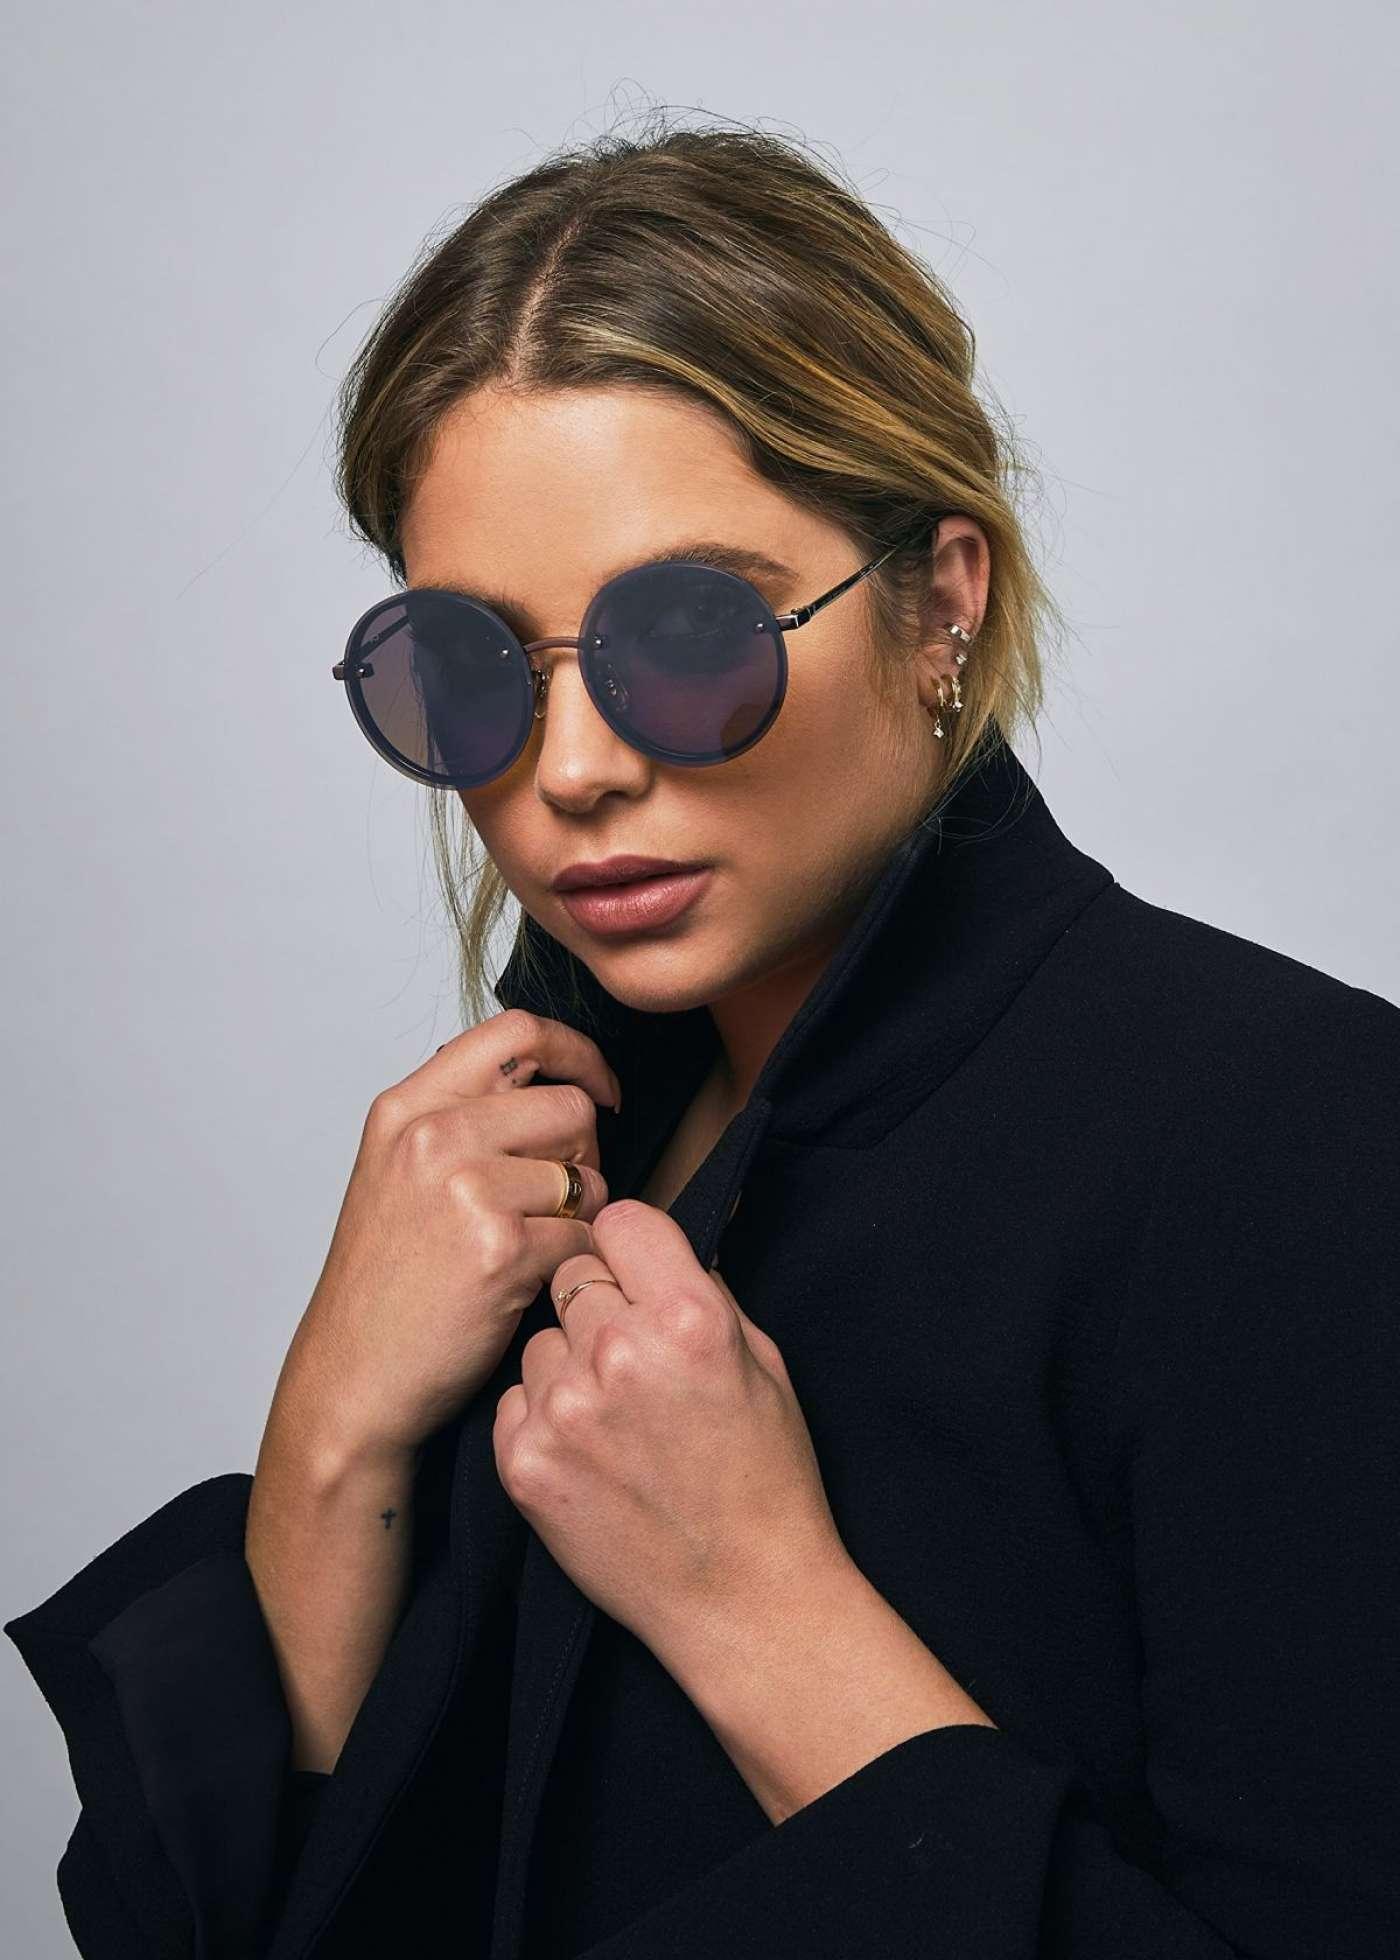 Ashley Benson 2017 : Ashley Benson: Prive Revaux Icon Collection 2017 Campaign -03